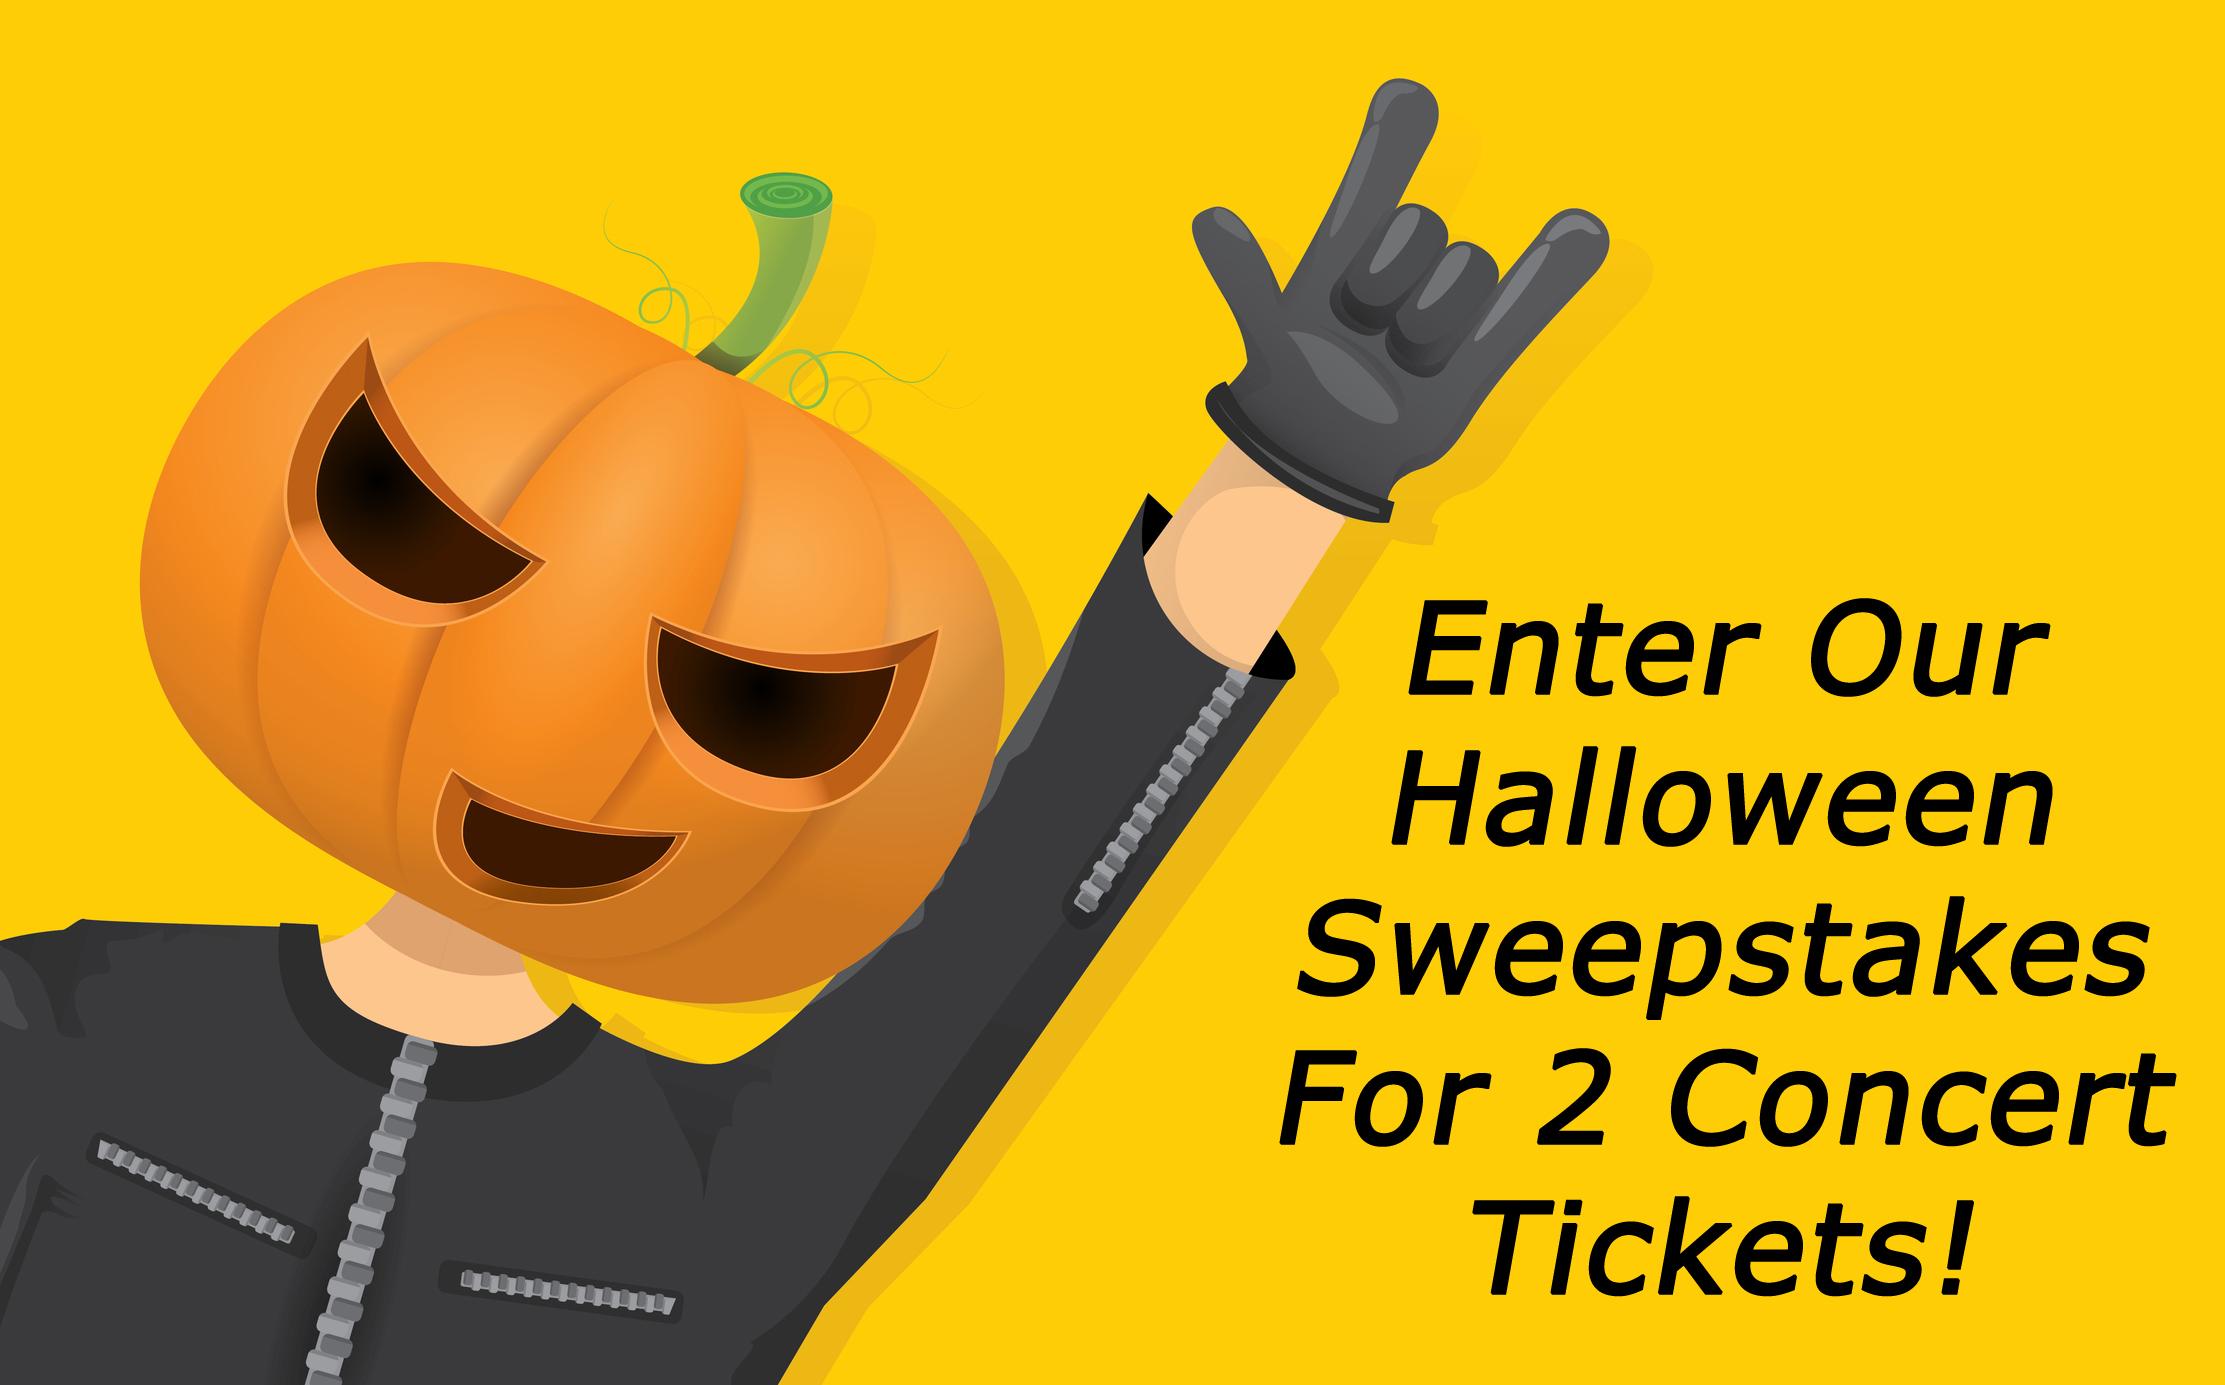 Rock.com Worldwide Concert Tickets Giveaway, Winner Chosen on Halloween at Midnight!